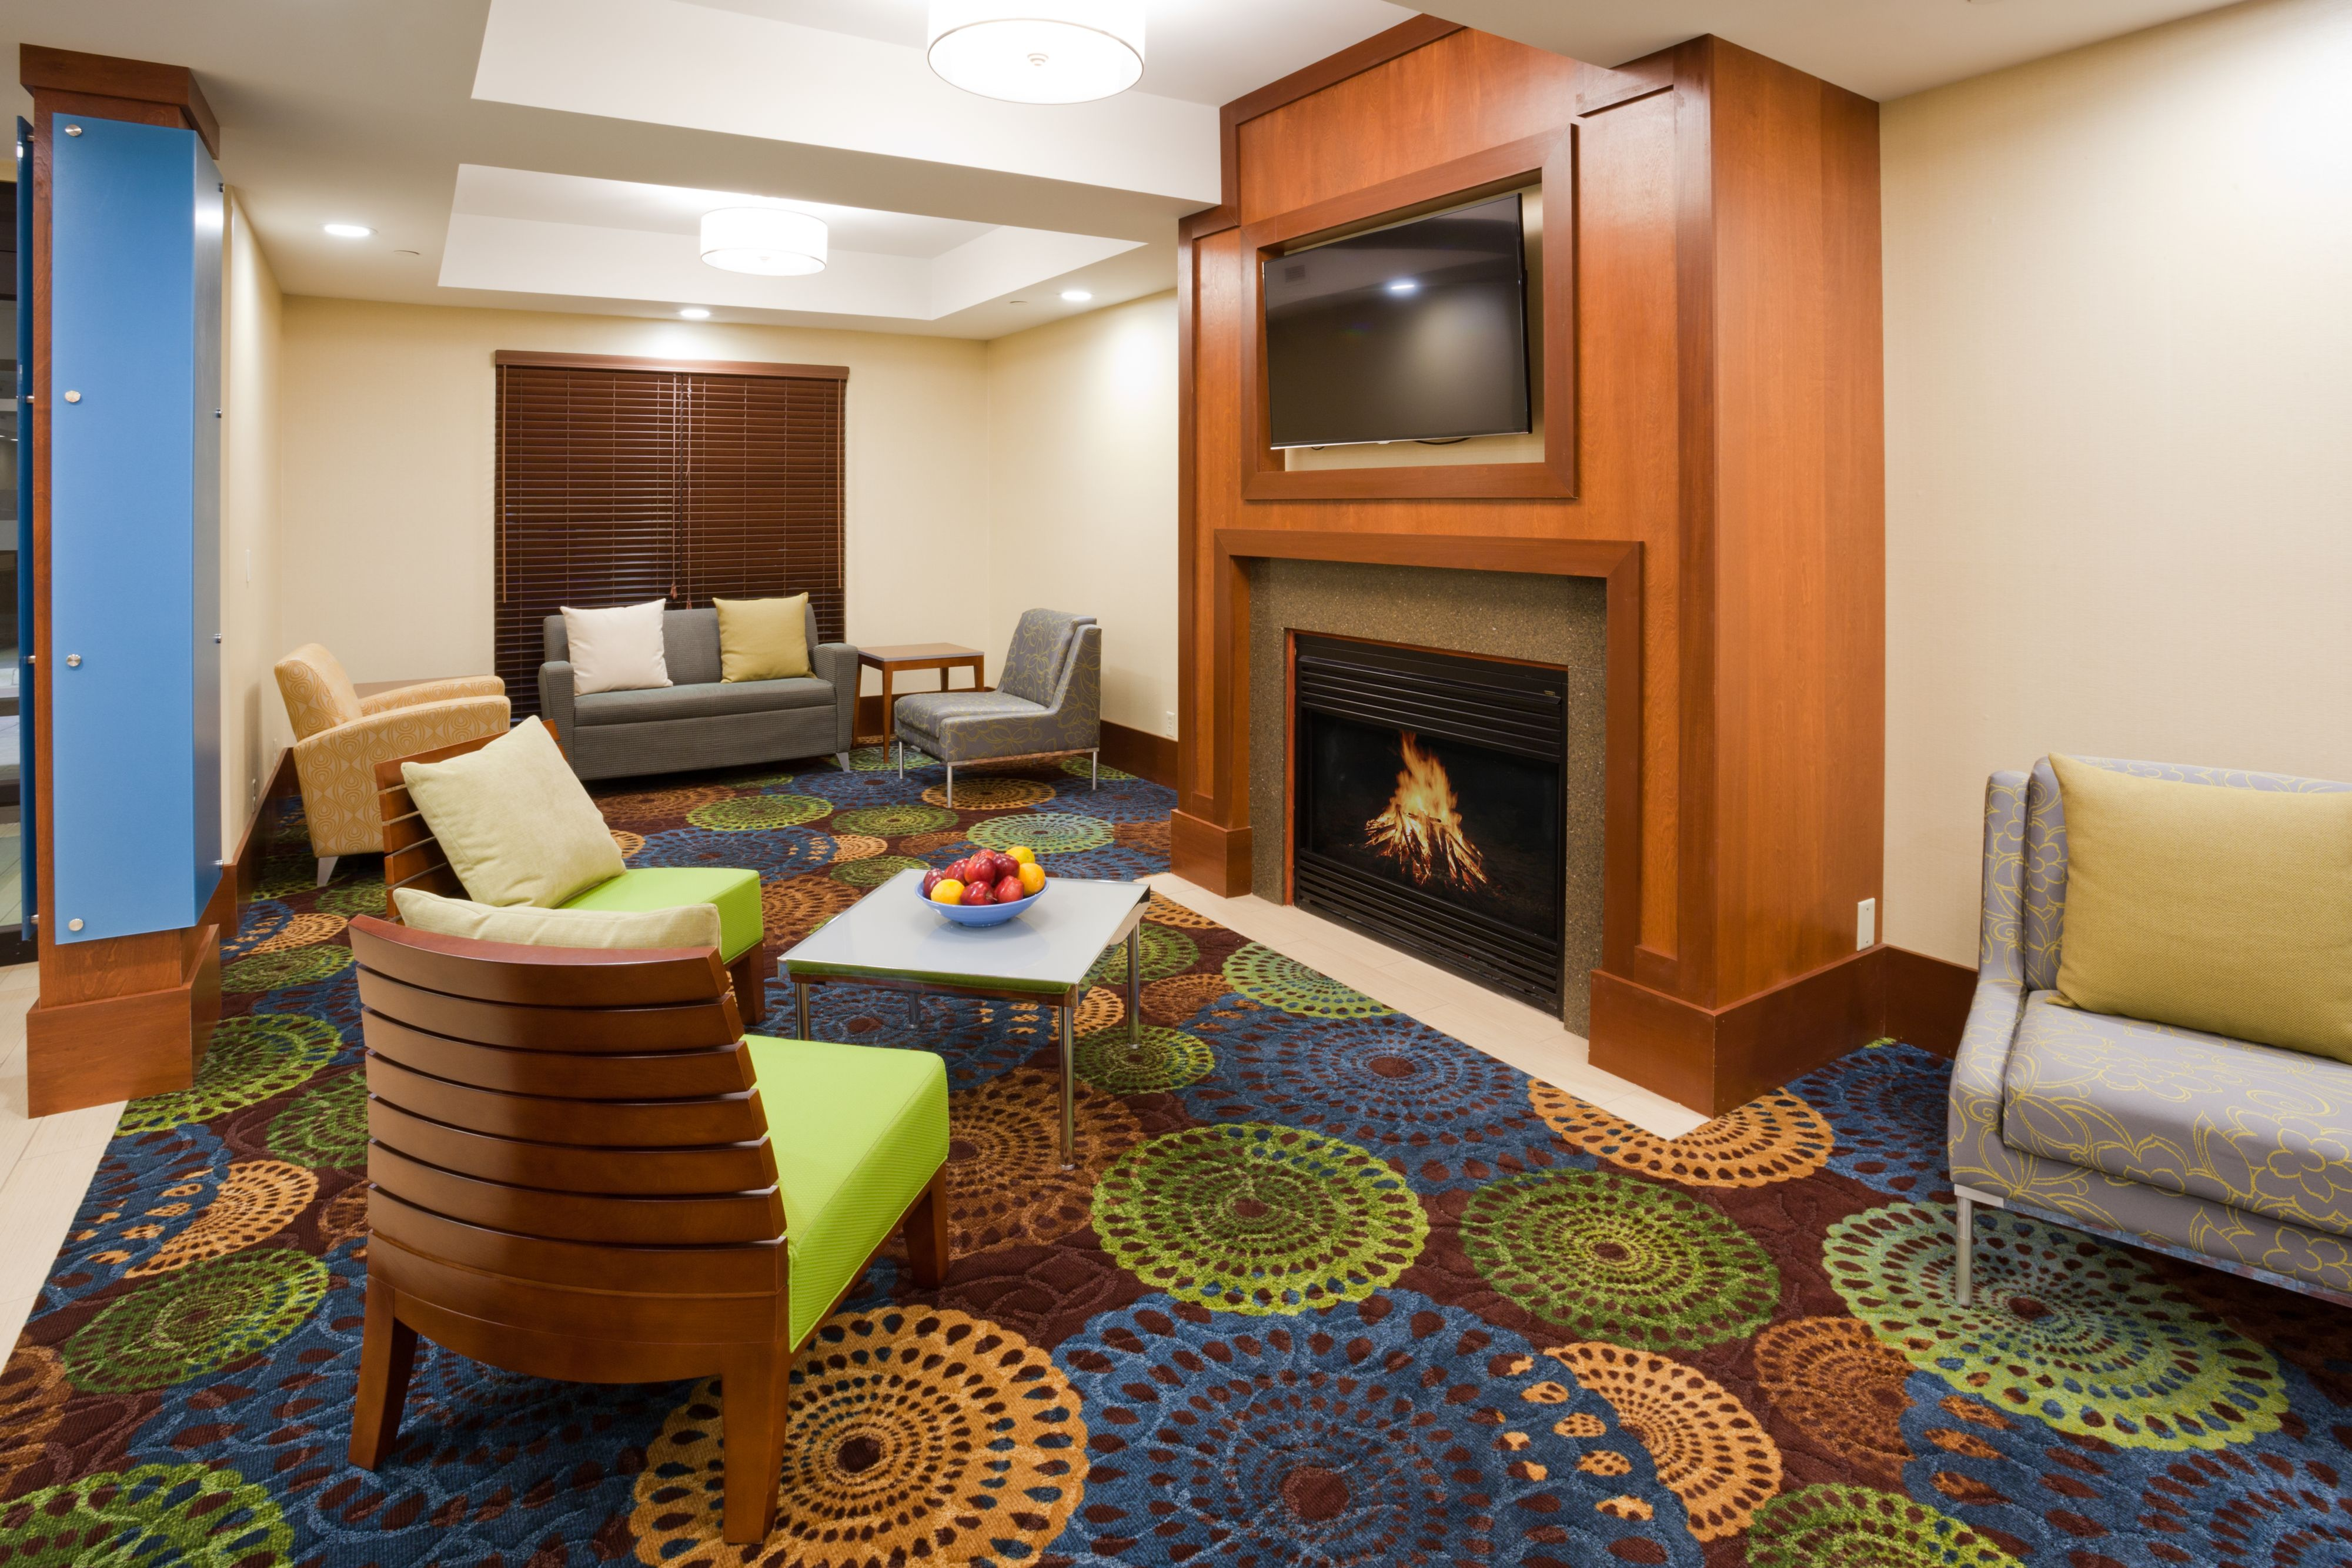 Holiday Inn Express Cedar Rapids (Collins Rd) image 4